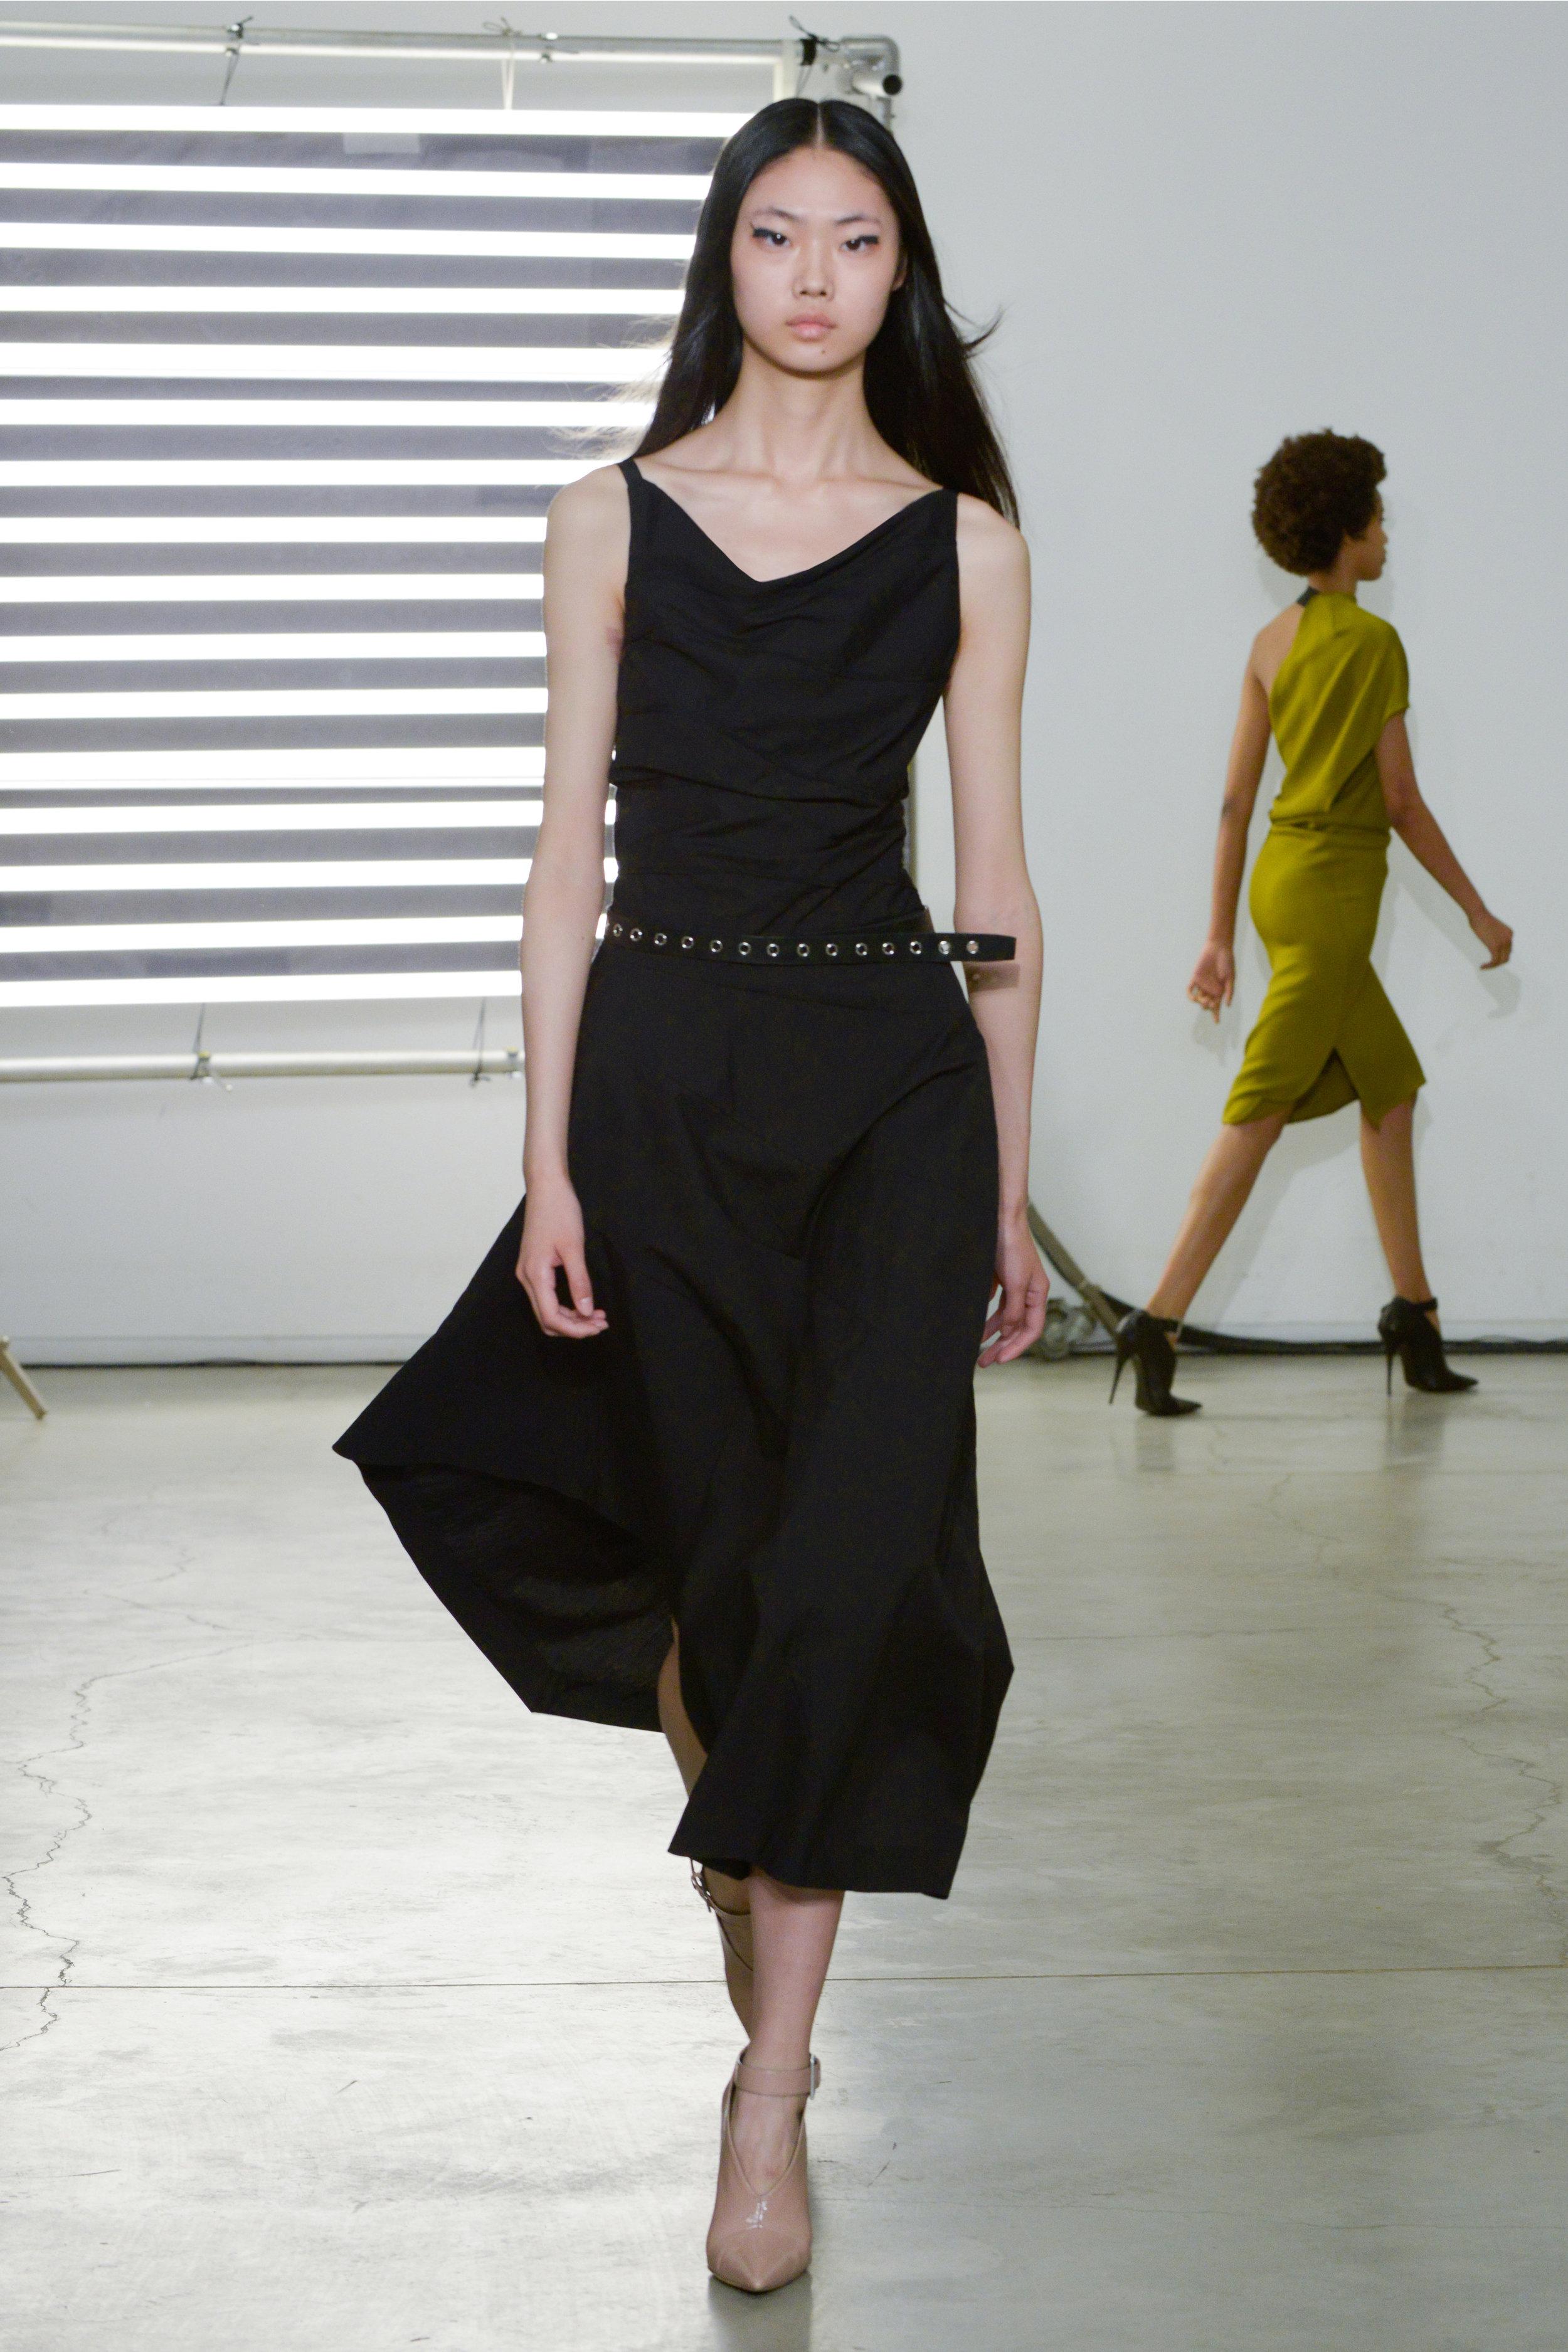 Look 17 Black textured cotton/nylon dress with black leather belt.